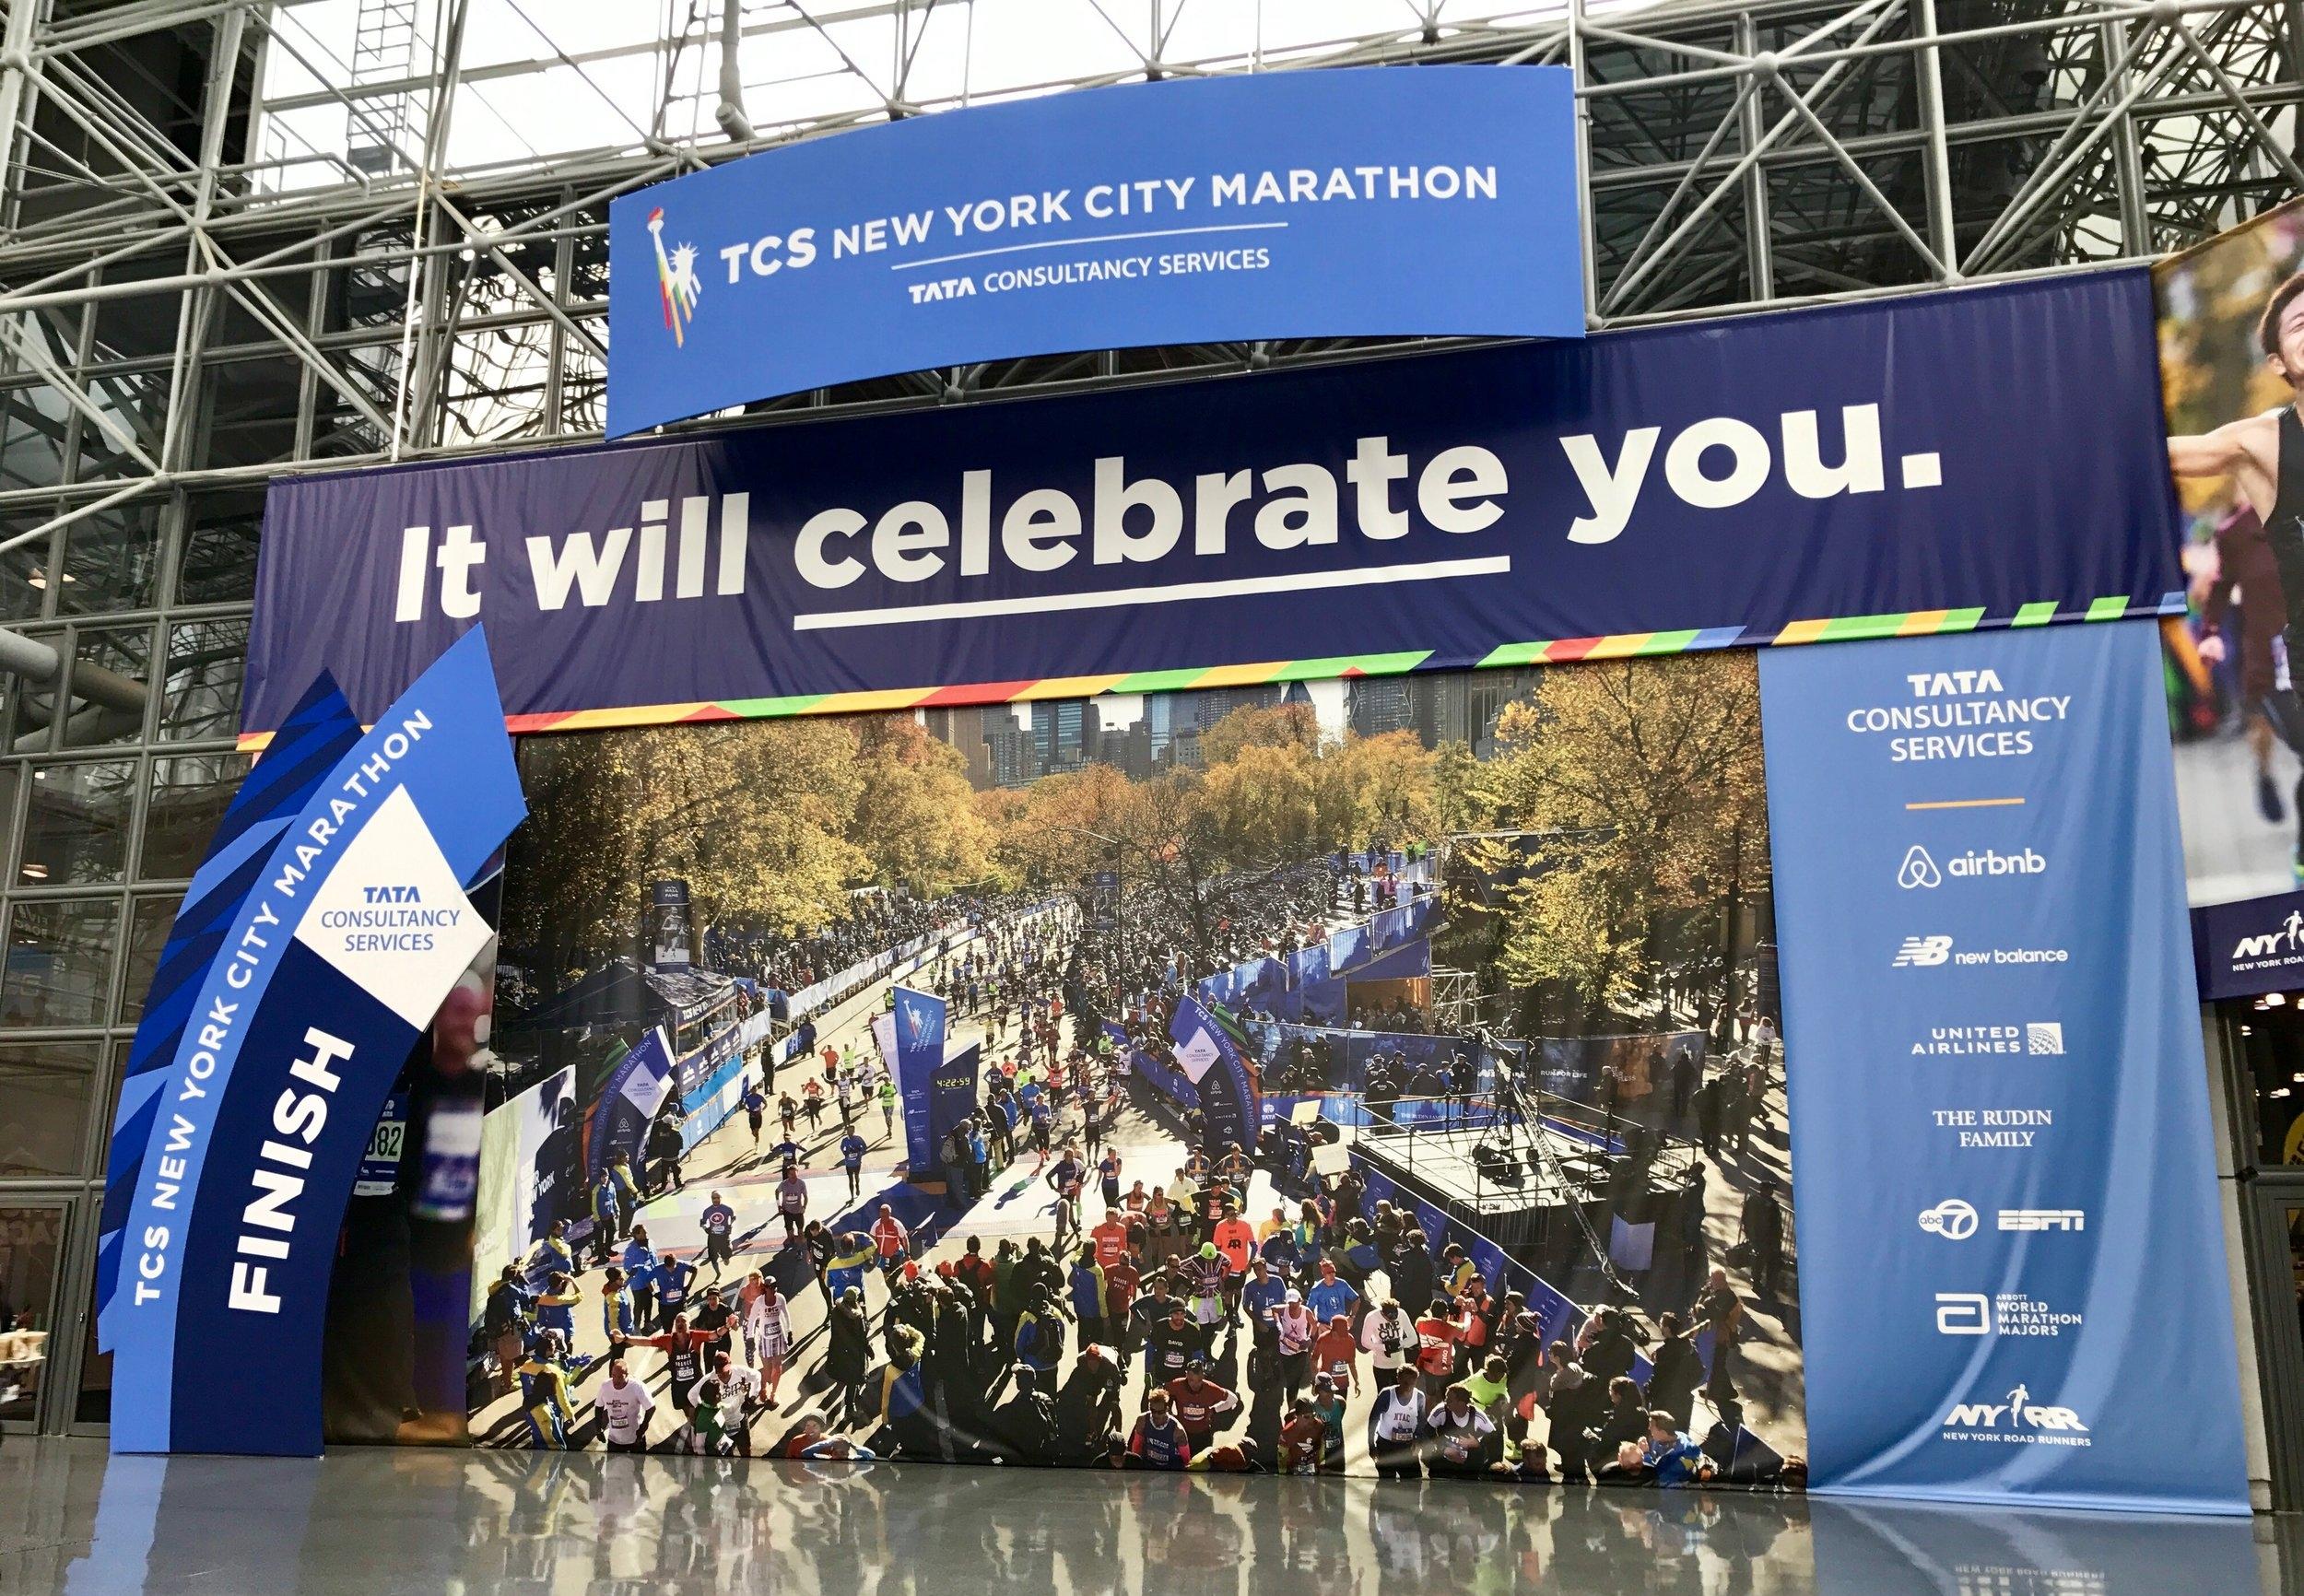 TCS NYC Marathon Case Study - Reimagining race day for the NYC Marathon